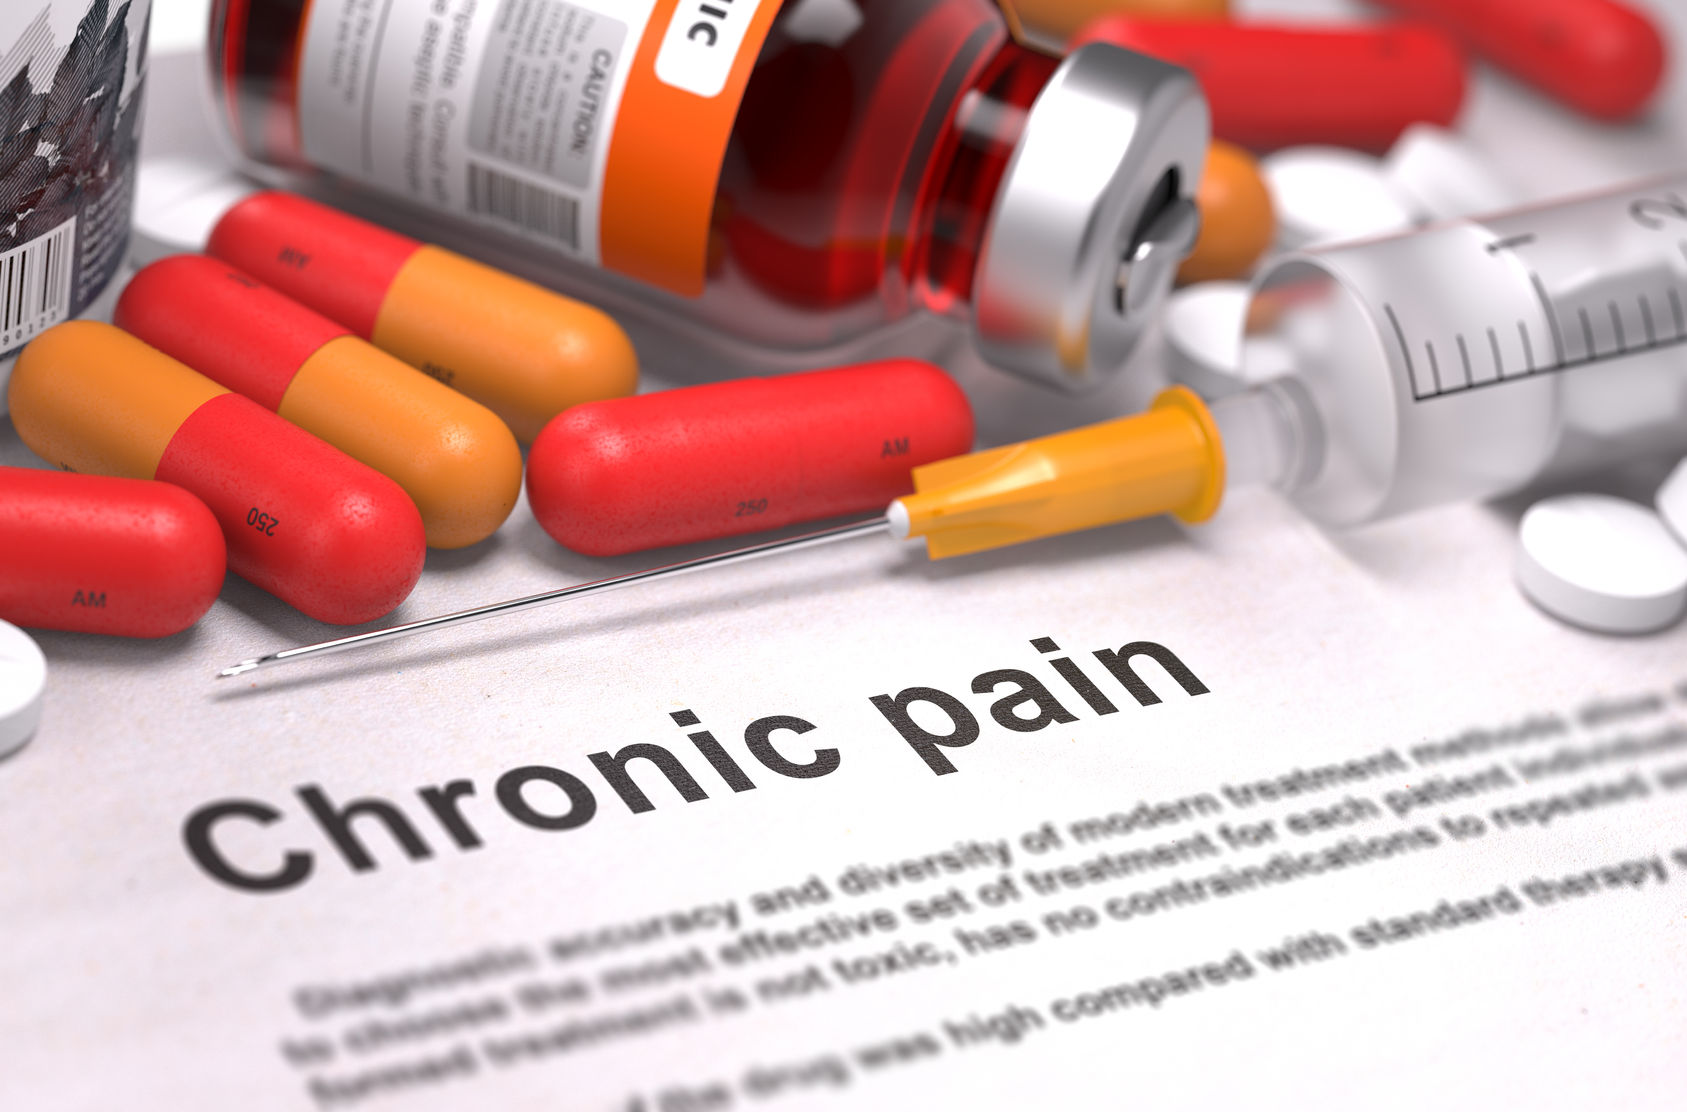 Chronic_Pain_Simon_Law_Group_Personal_Inj_Attorney.jpg